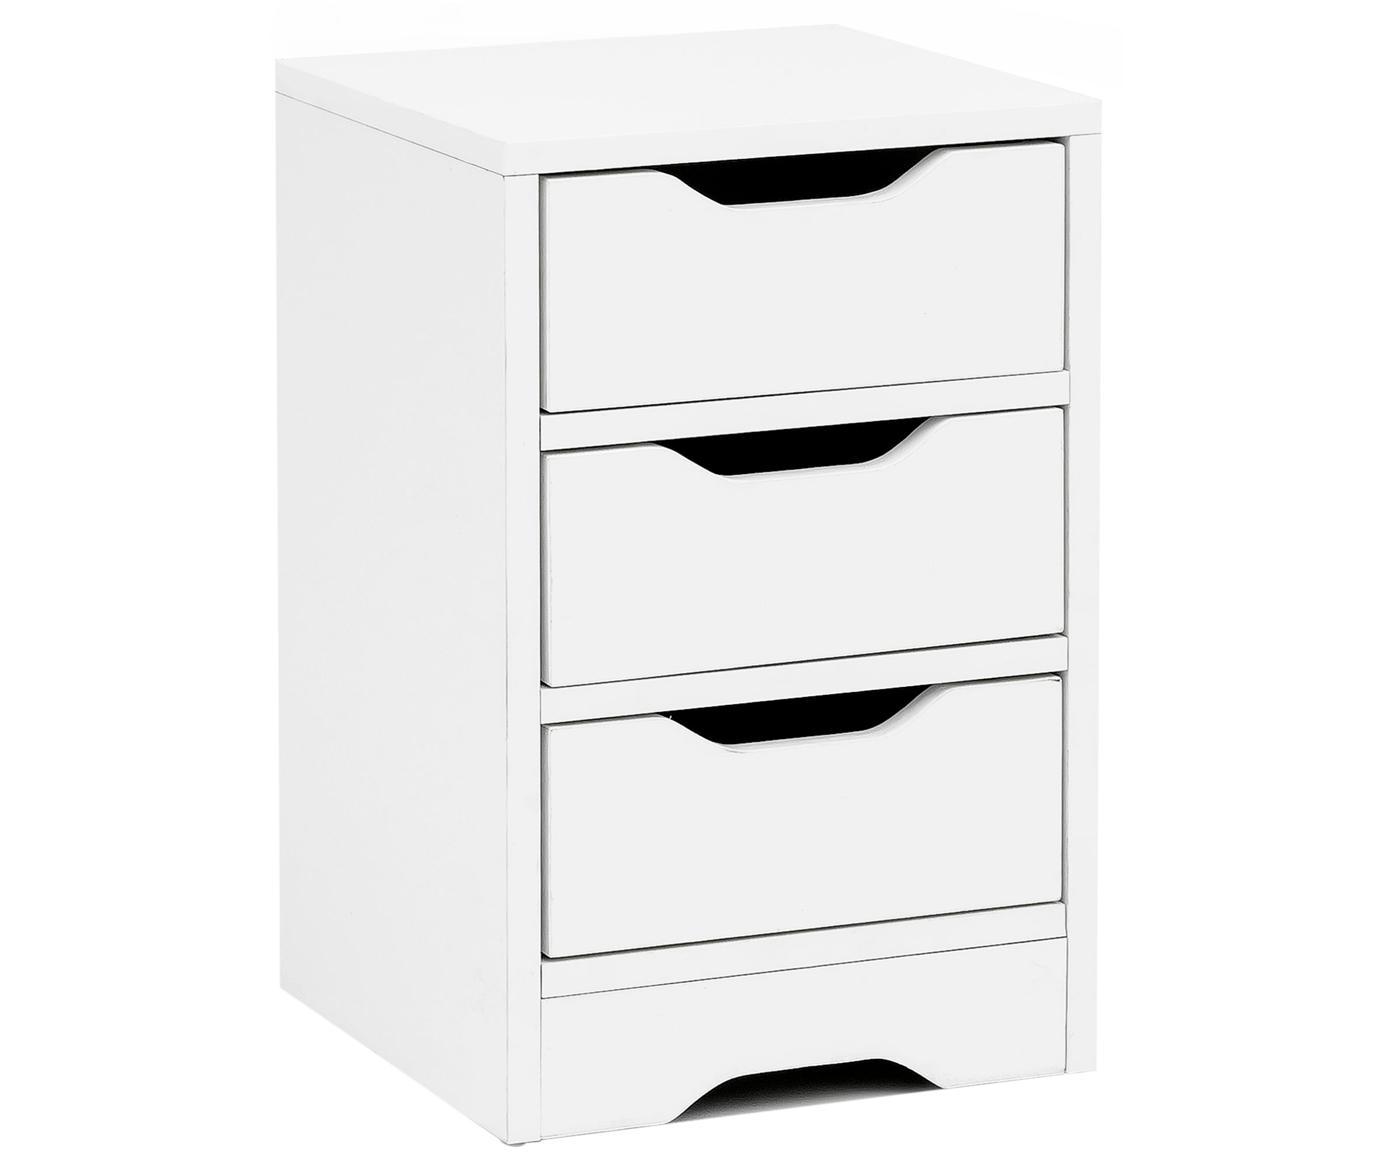 Comodino con 3 cassetti Wohnling, Truciolato, melaminico, Bianco, Larg. 31 x Alt. 49 cm